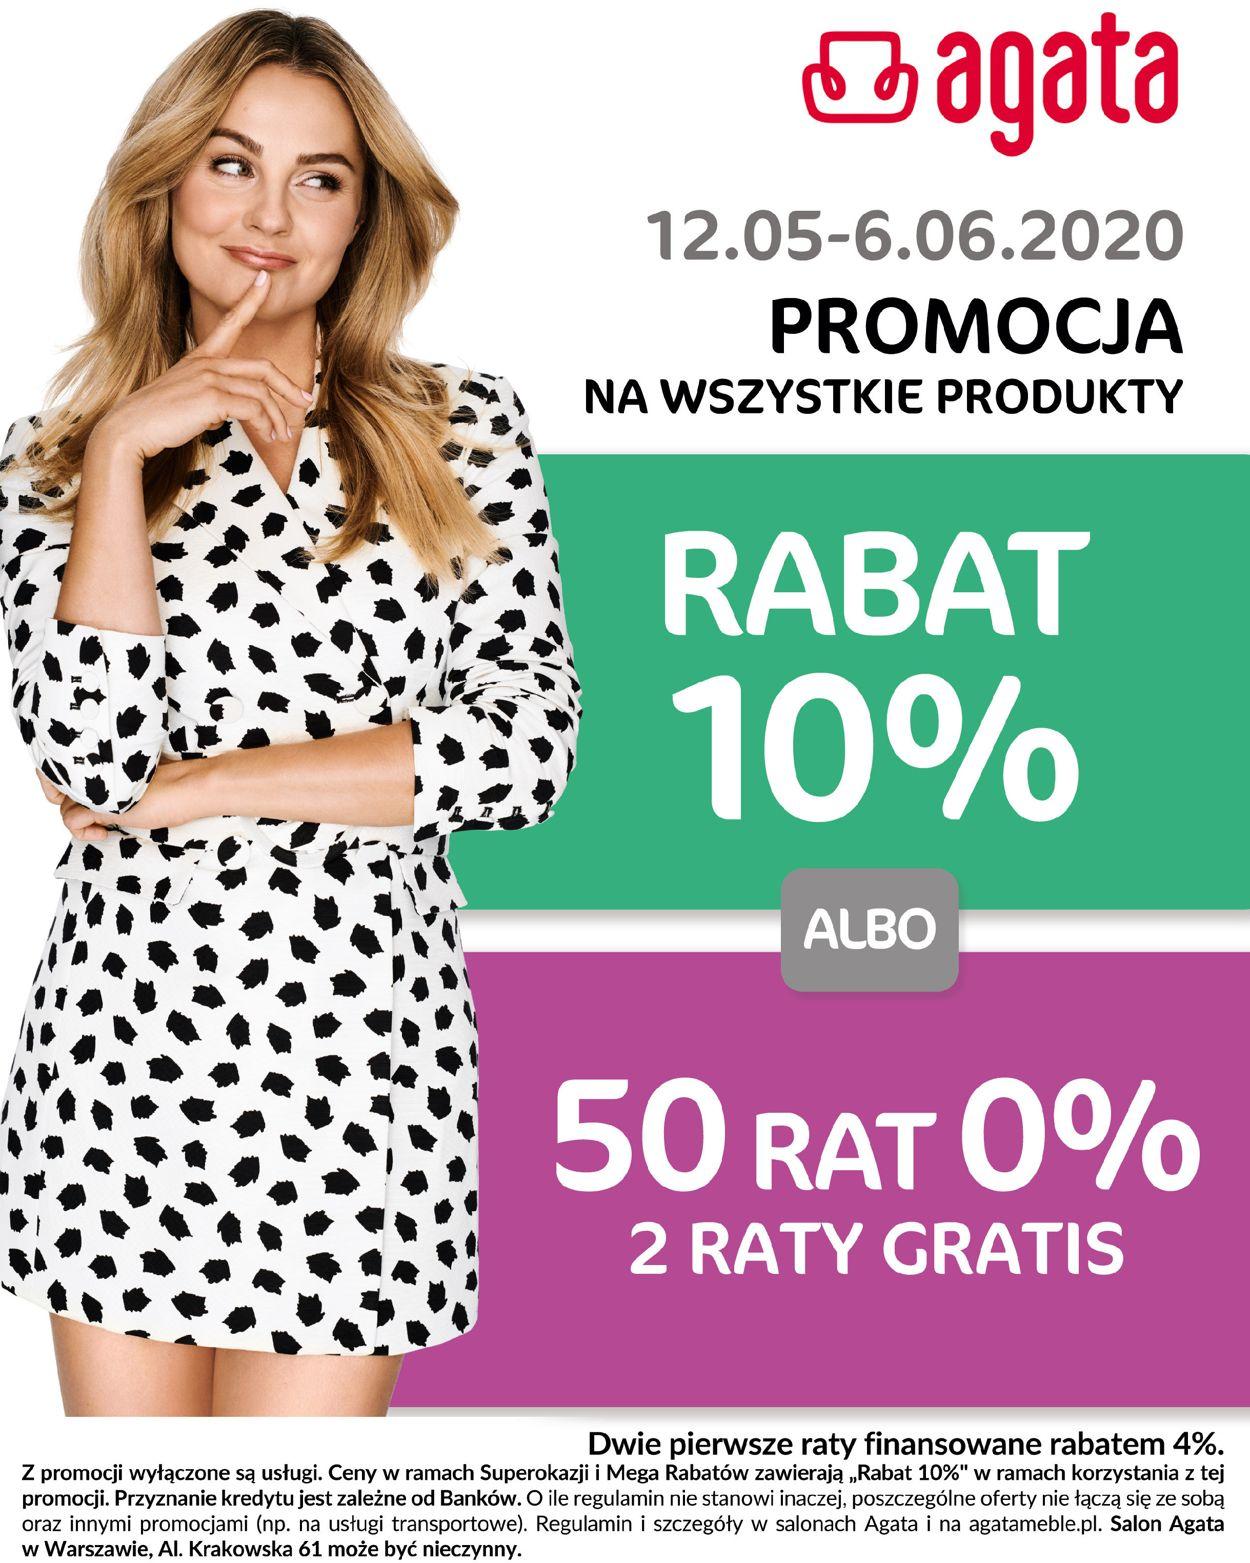 Gazetka promocyjna Agata Meble - 12.05-06.06.2020